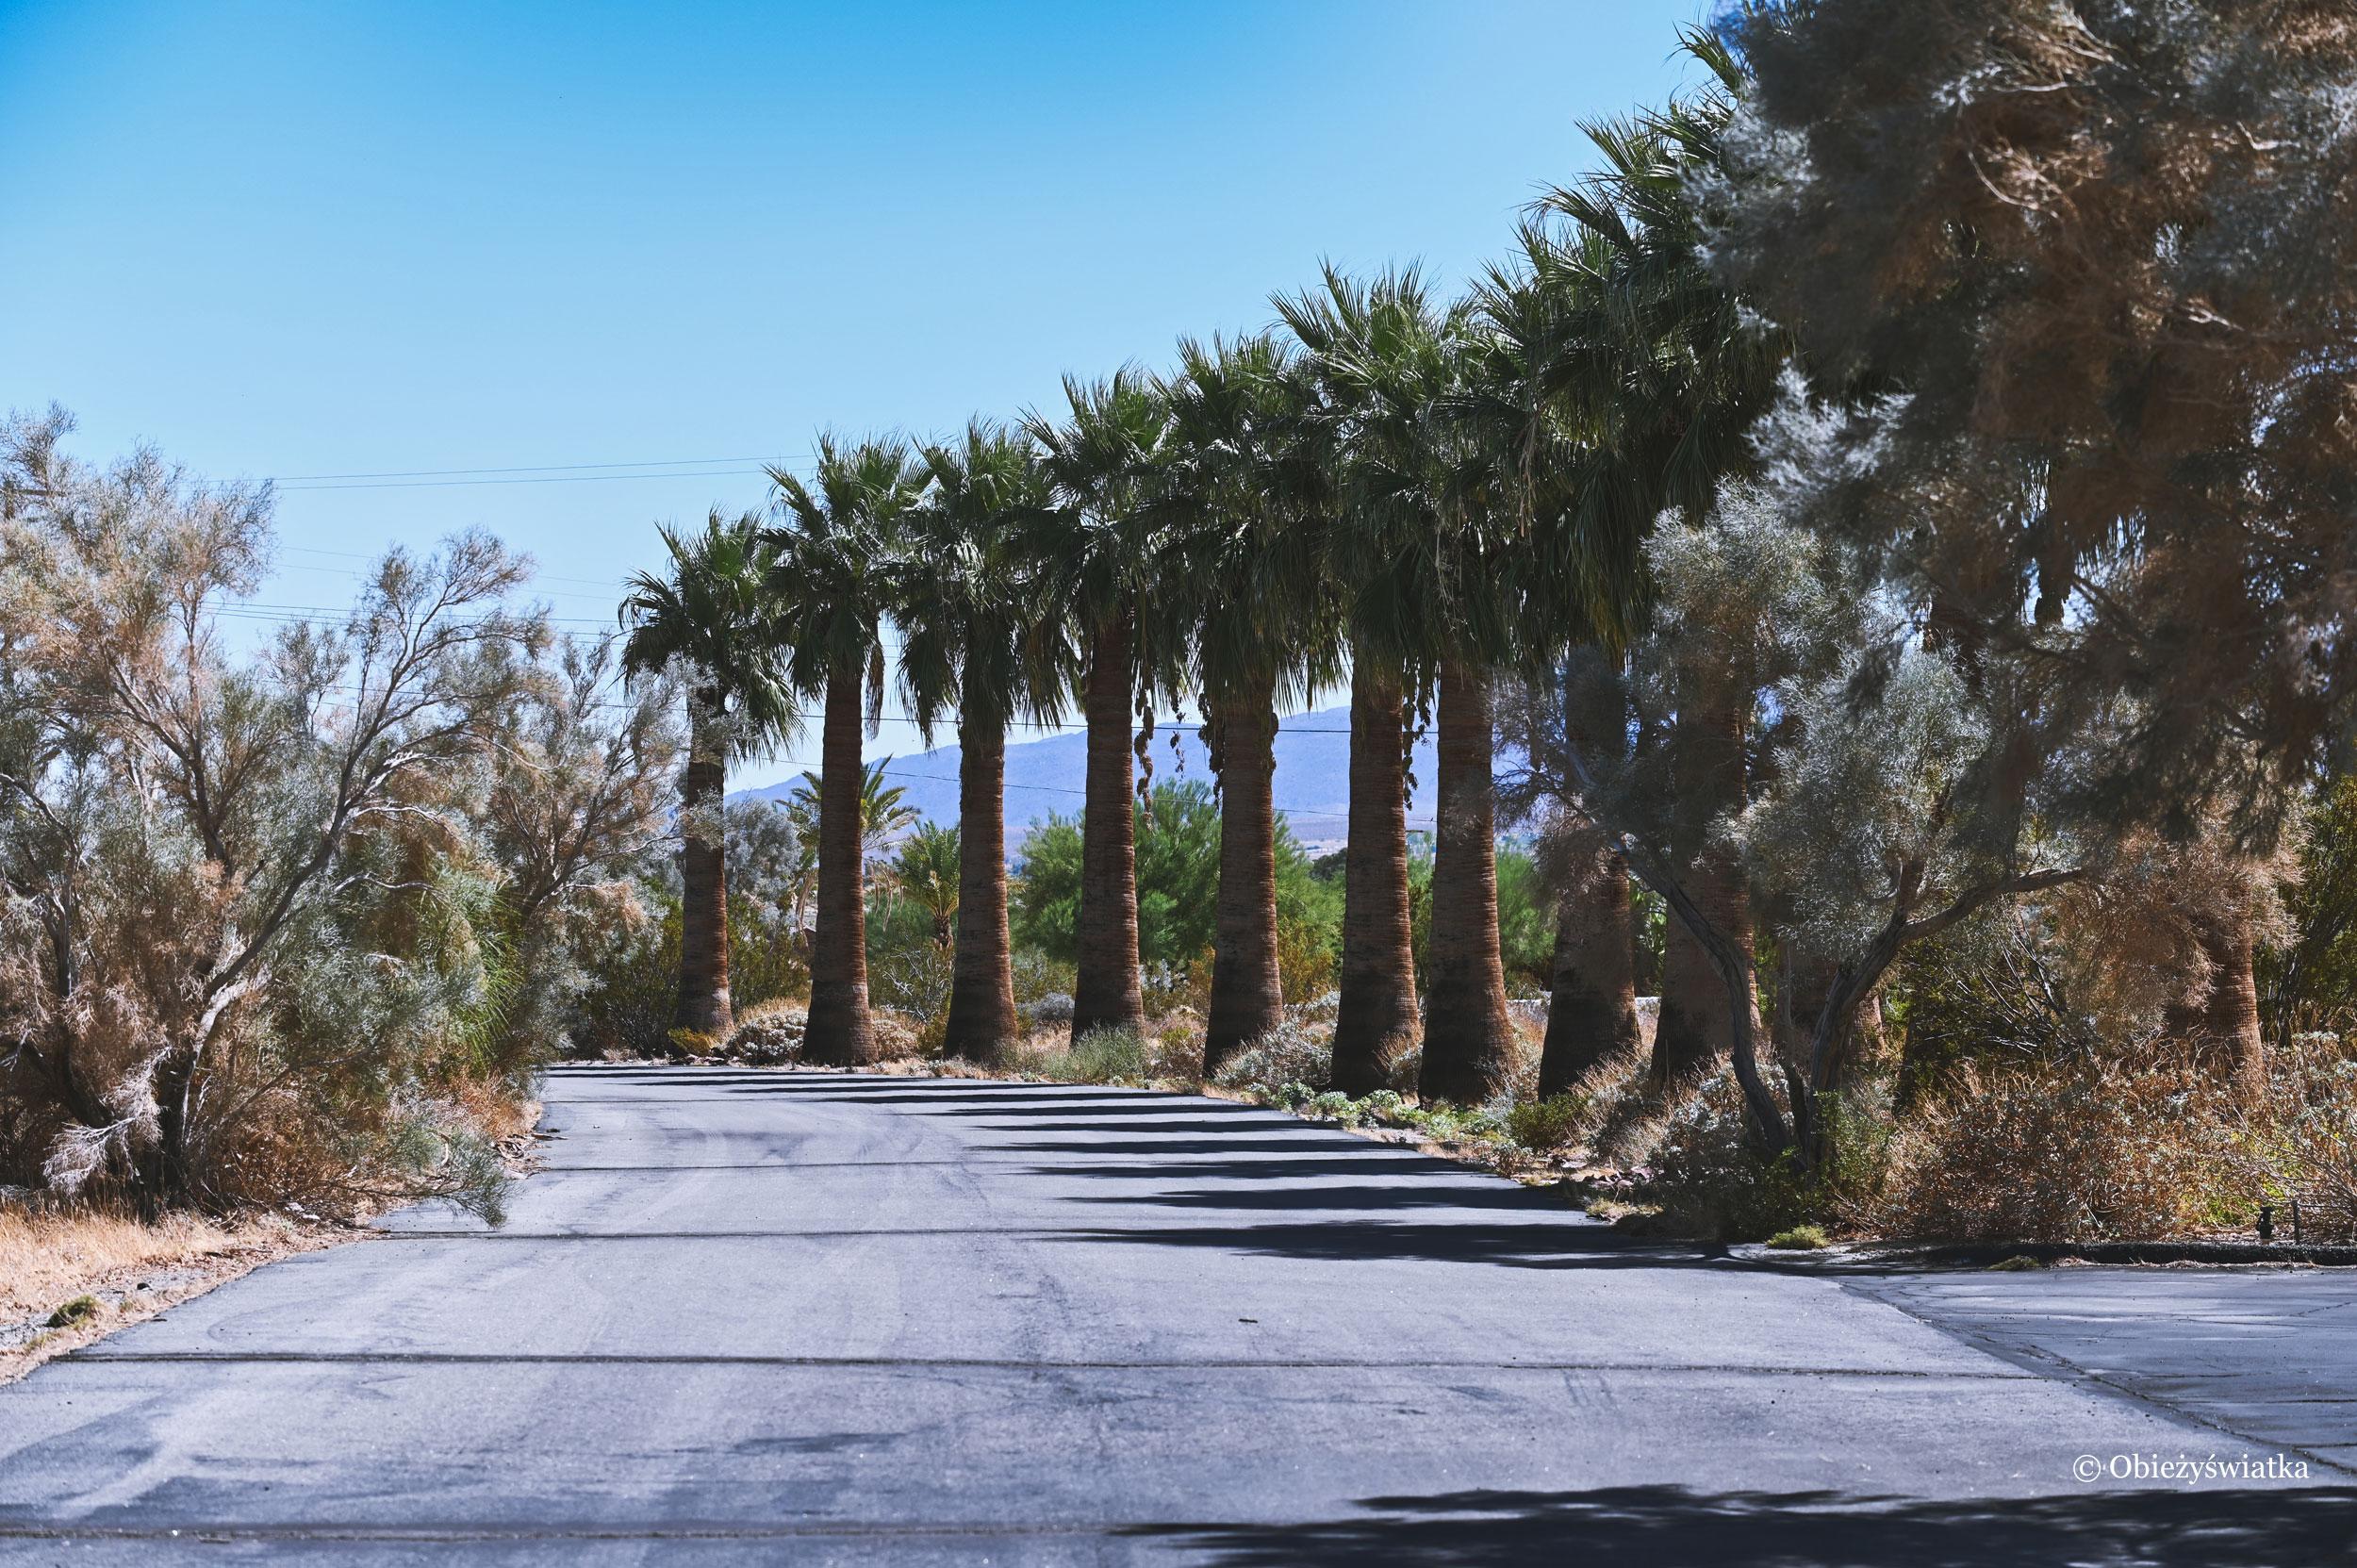 Aleja Palmowa w Borrego Springs, Kalifornia